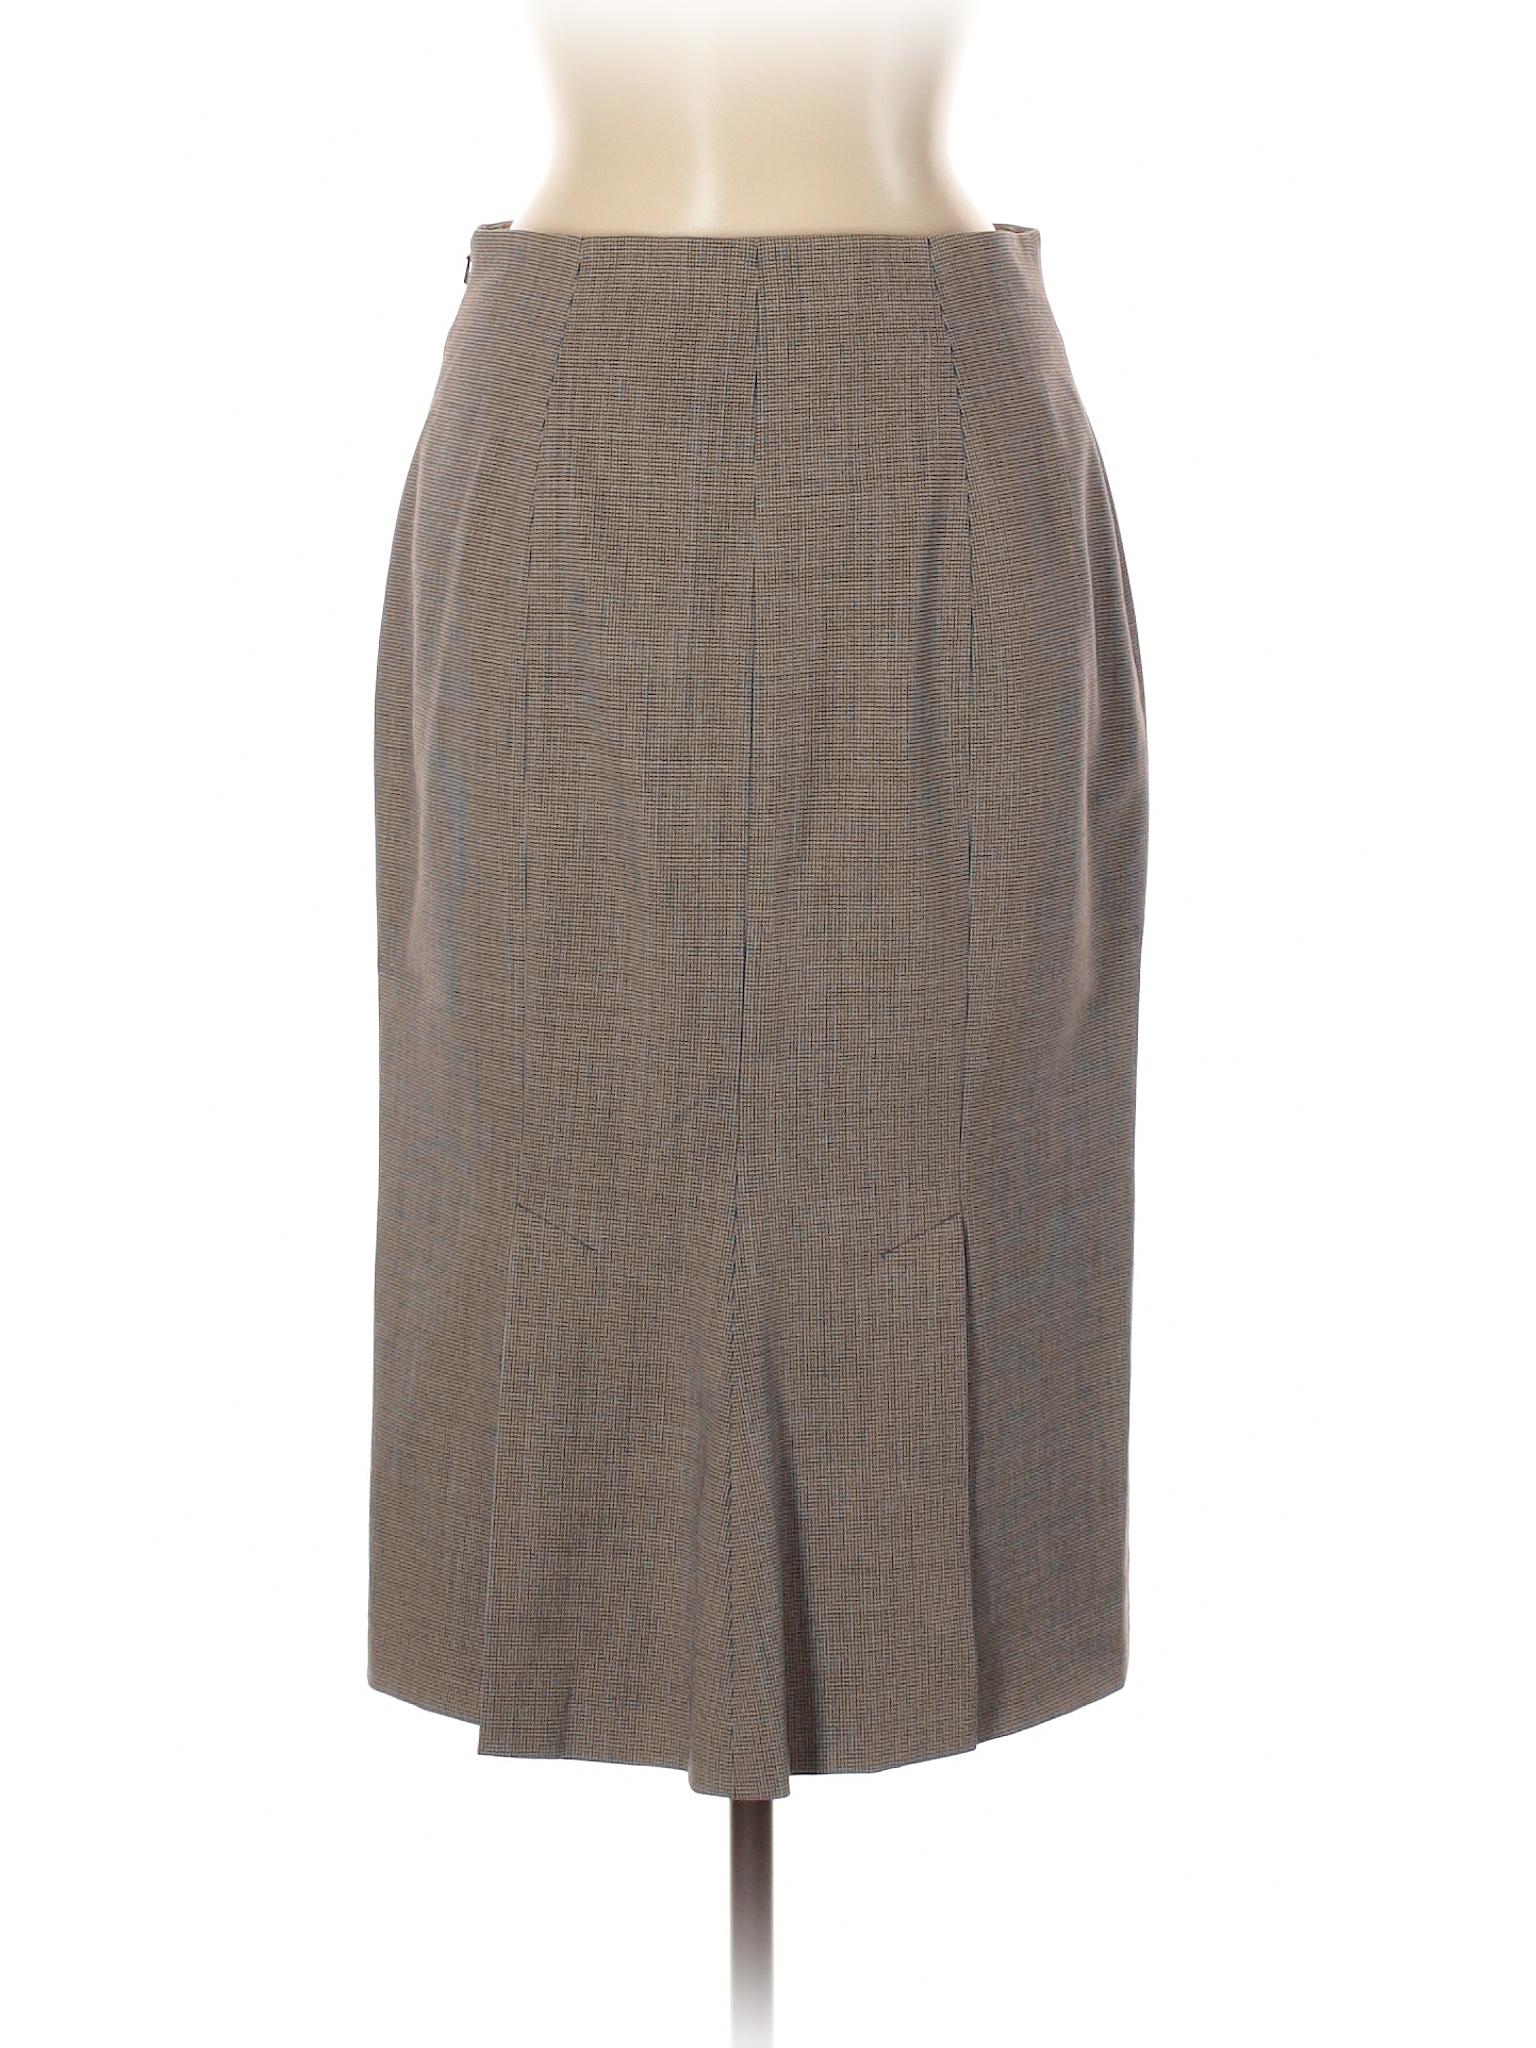 Boutique Boutique Wool Skirt Skirt Wool Wool Skirt Skirt Boutique Boutique Wool Zqdn8Uw8